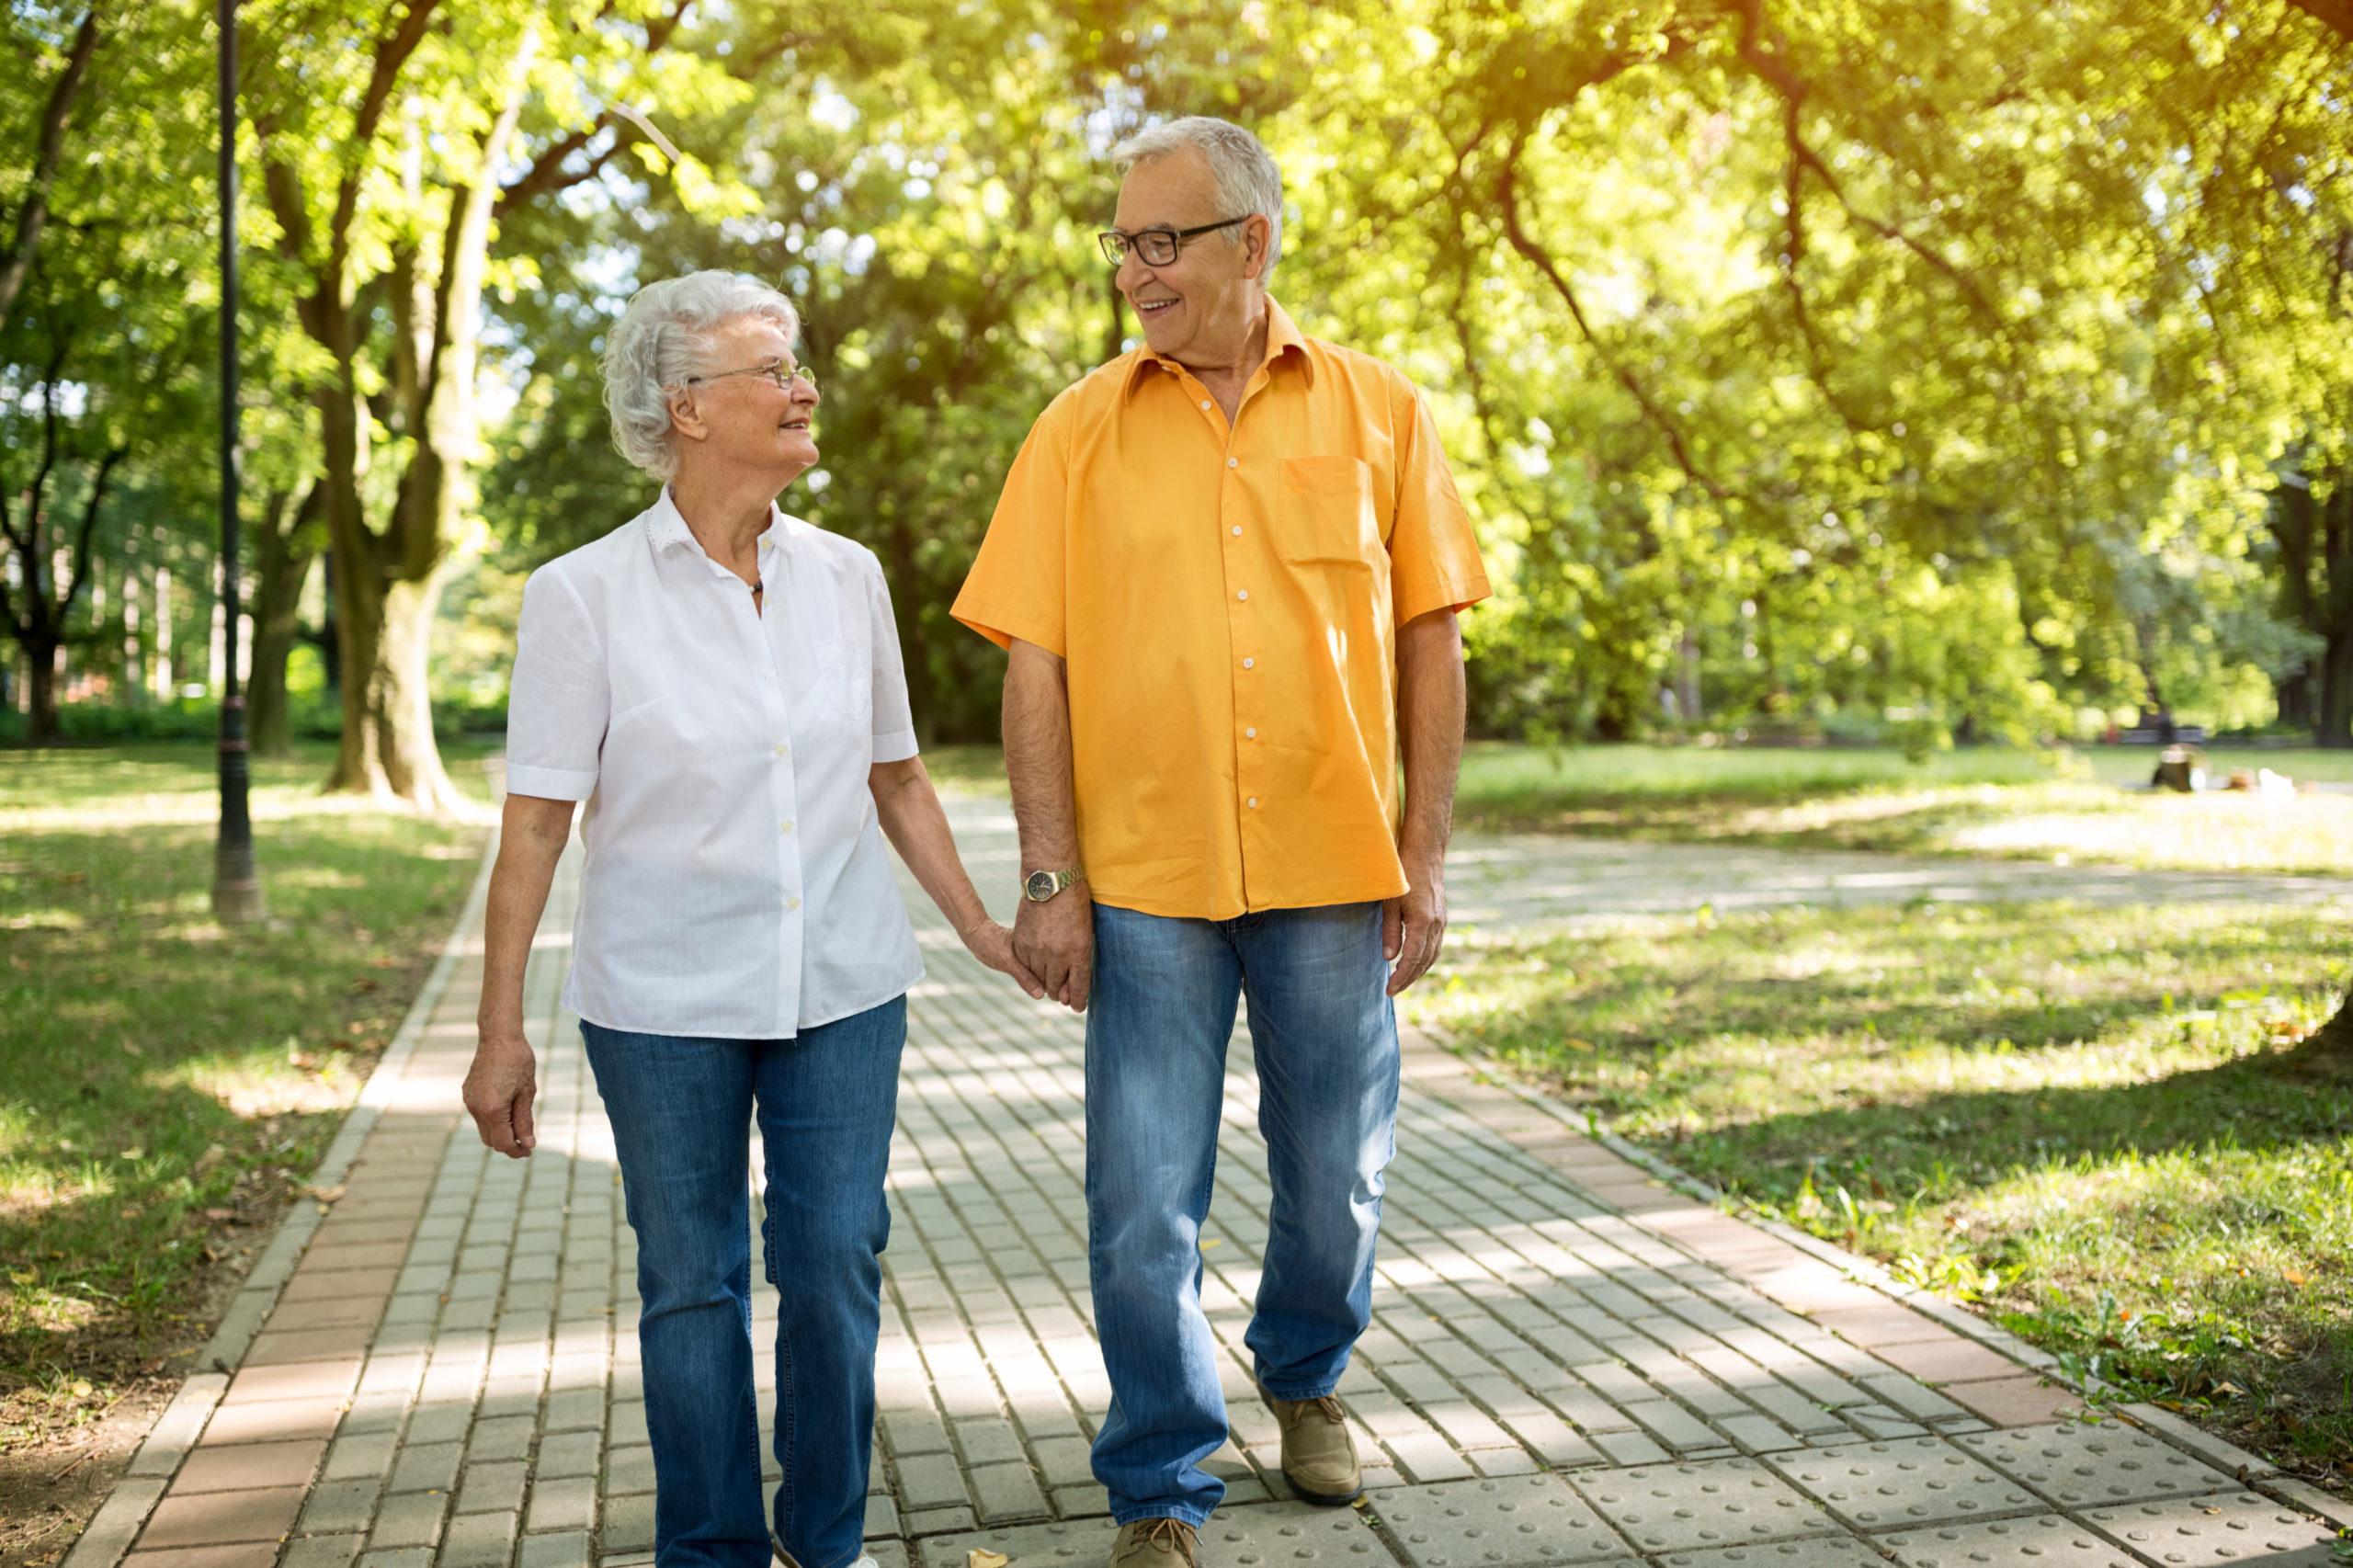 Senior couple enjoying a walk outdoors